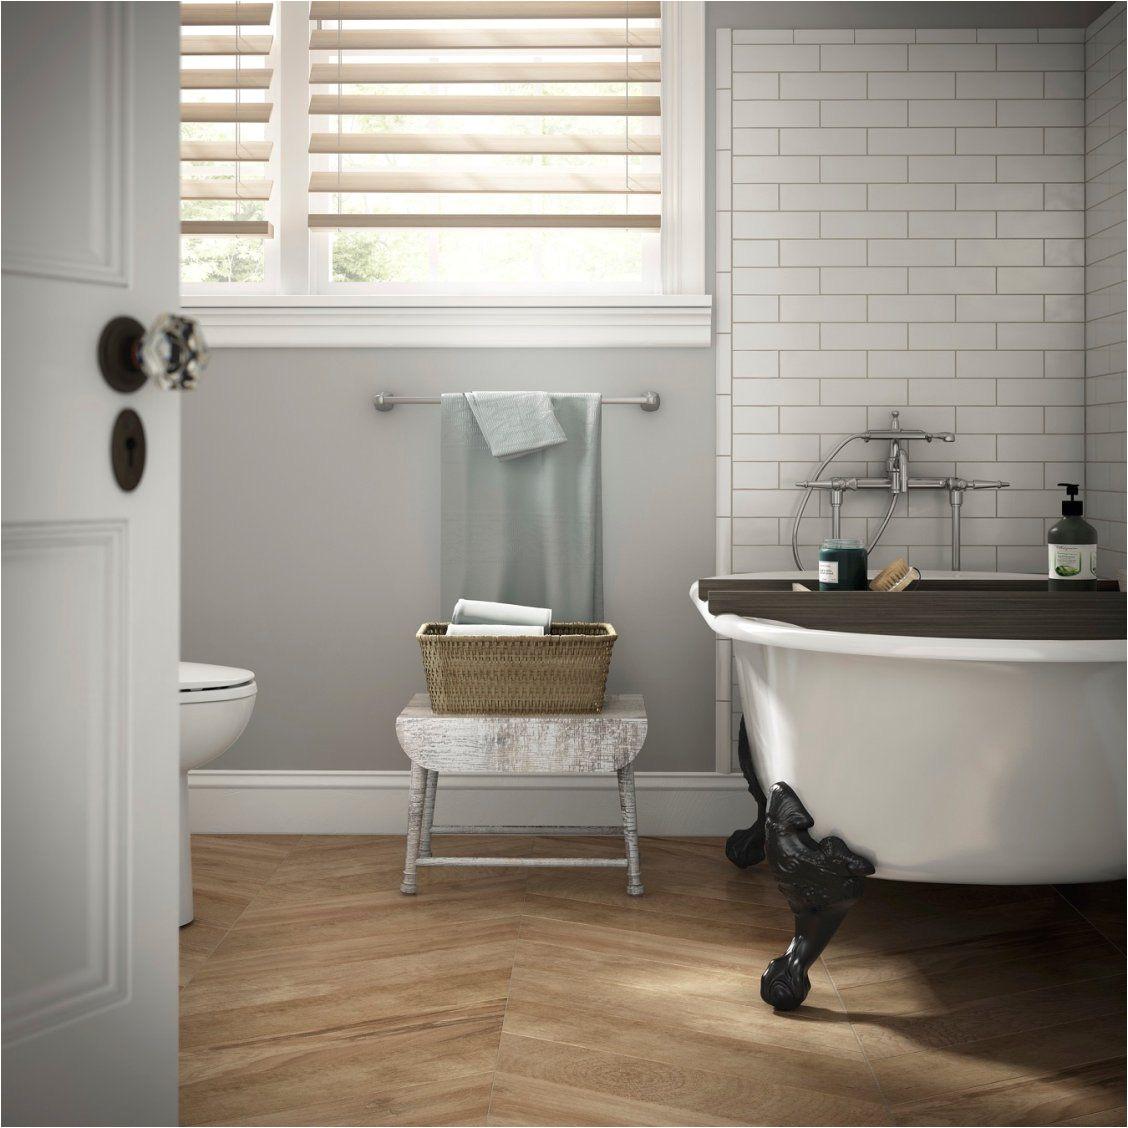 create a spa like bathroom with soft gray walls a clawfoot tub striking herringbone floors and classic white subway tiles around the tub